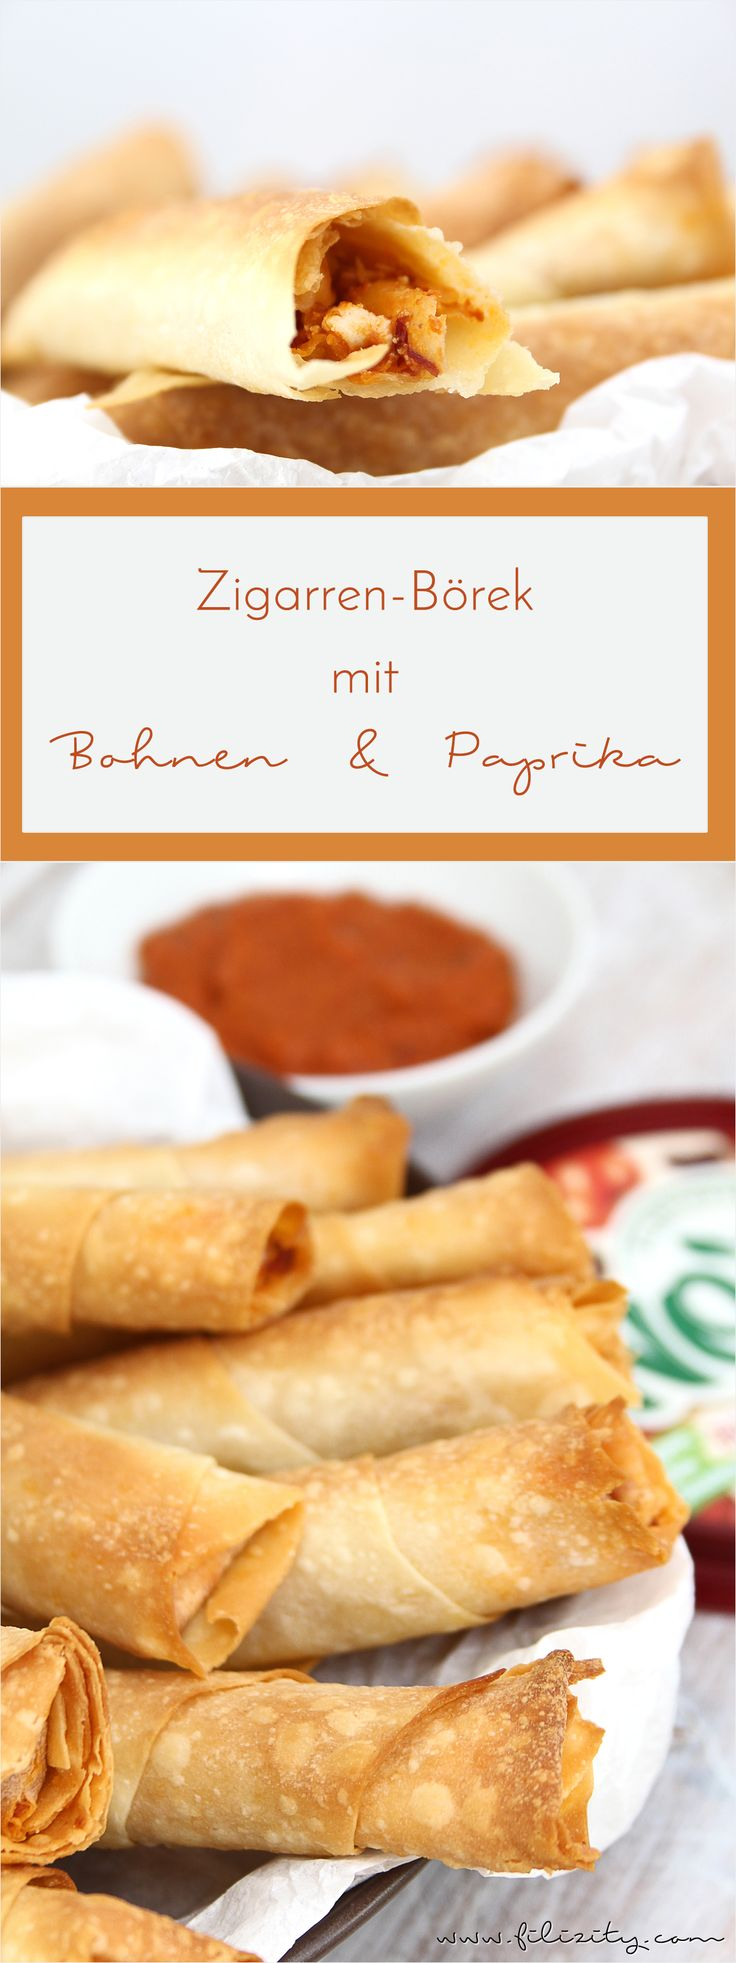 Perfektes Party- / Finger-Food für Silvester, Geburtstage uvm.: Zigarrenbörek (Sigara Böregi) mit vegetarischer Bohne-Paprika-Füllung #rezept #party #silvester #börek